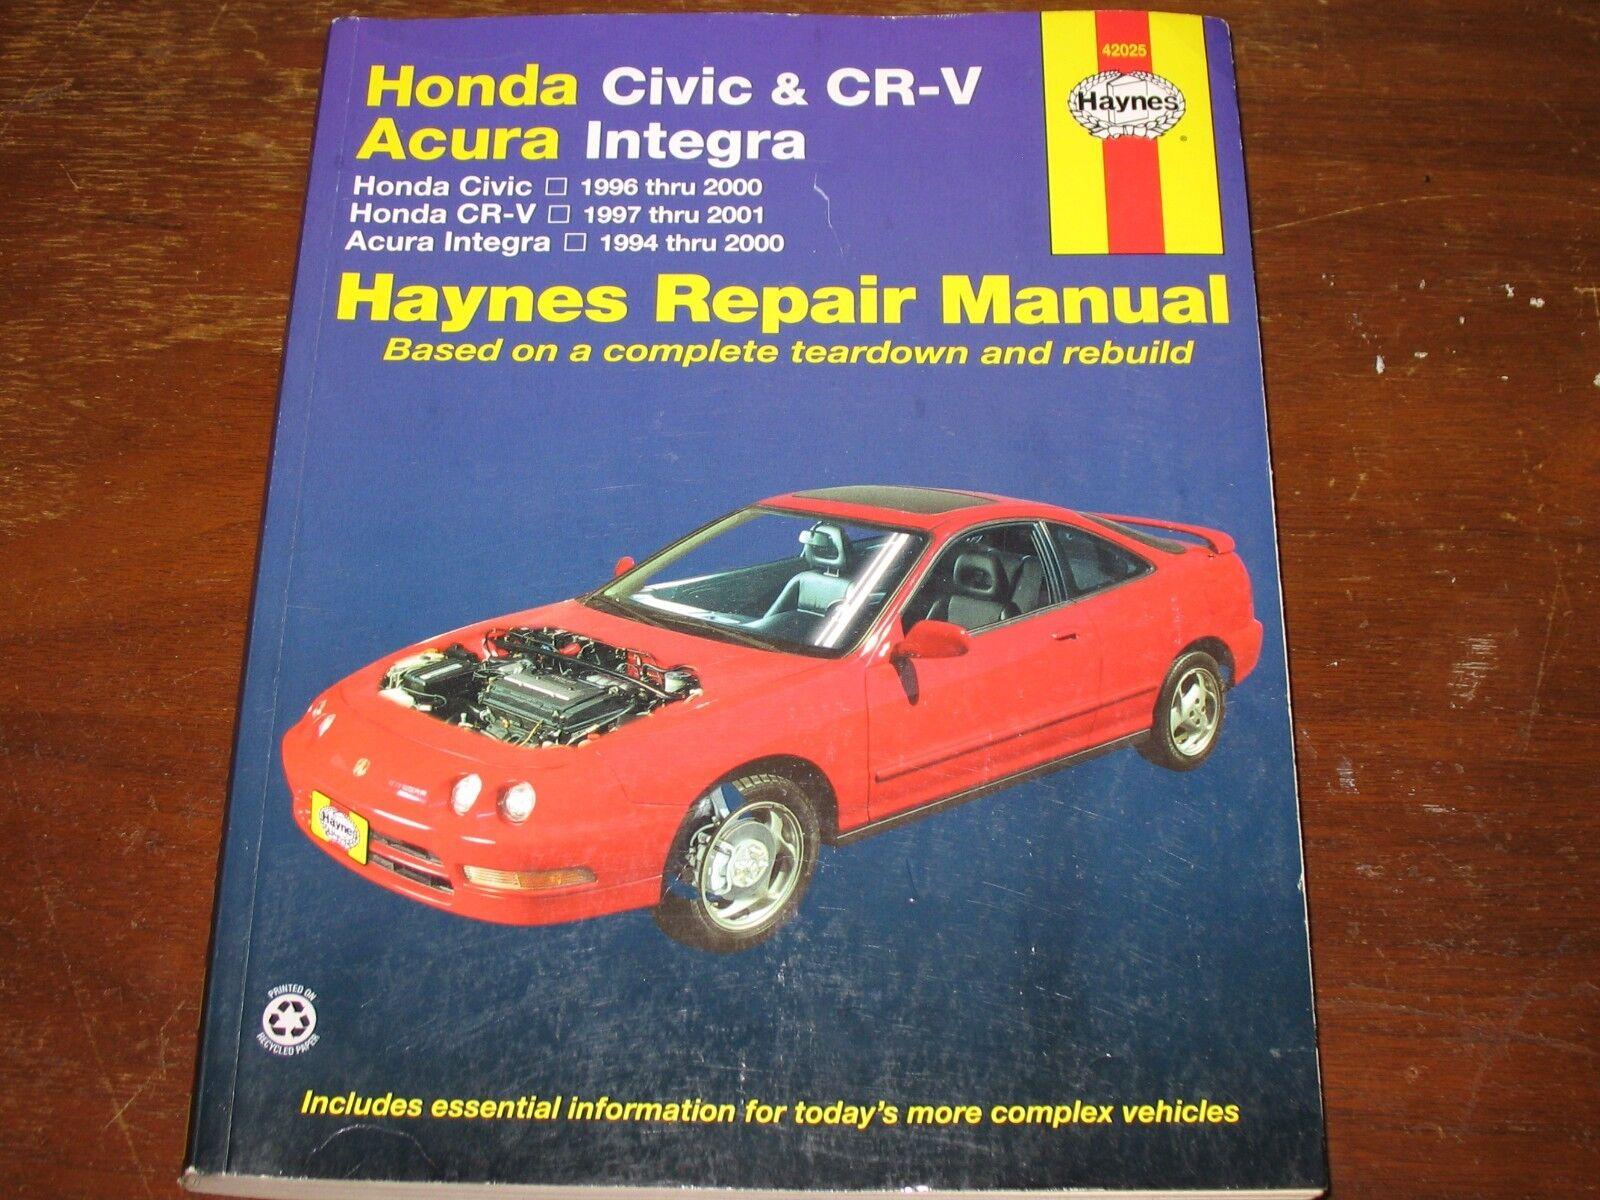 haynes repair manual for honda civic cr v acura integra 1994 2001 ebay rh ebay com Haynes Manual Pictures Back Haynes Manuals UK